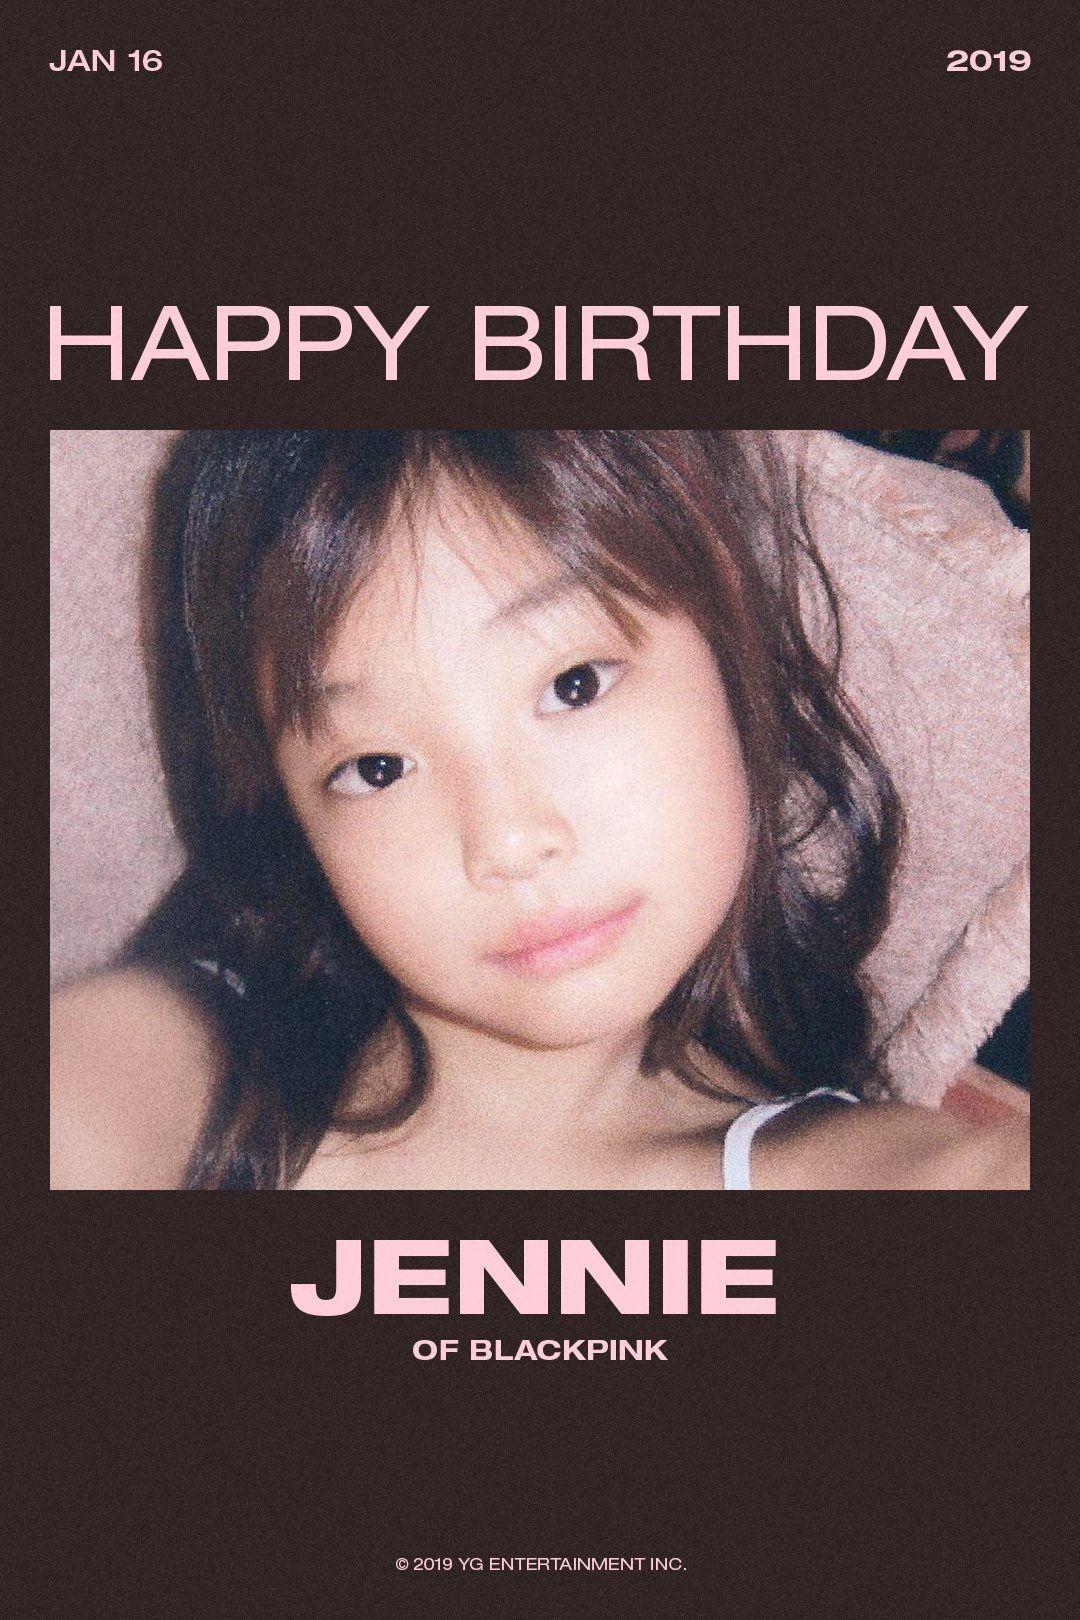 Lagu Happy Birthday Korea : happy, birthday, korea, HAPPY, BIRTHDAY, #JENNIE, #BLACKPINK, #블랙핑크, #제니, #HAPPYBIRTHDAY, #20190116, Entertainment,, Lagu,, Black